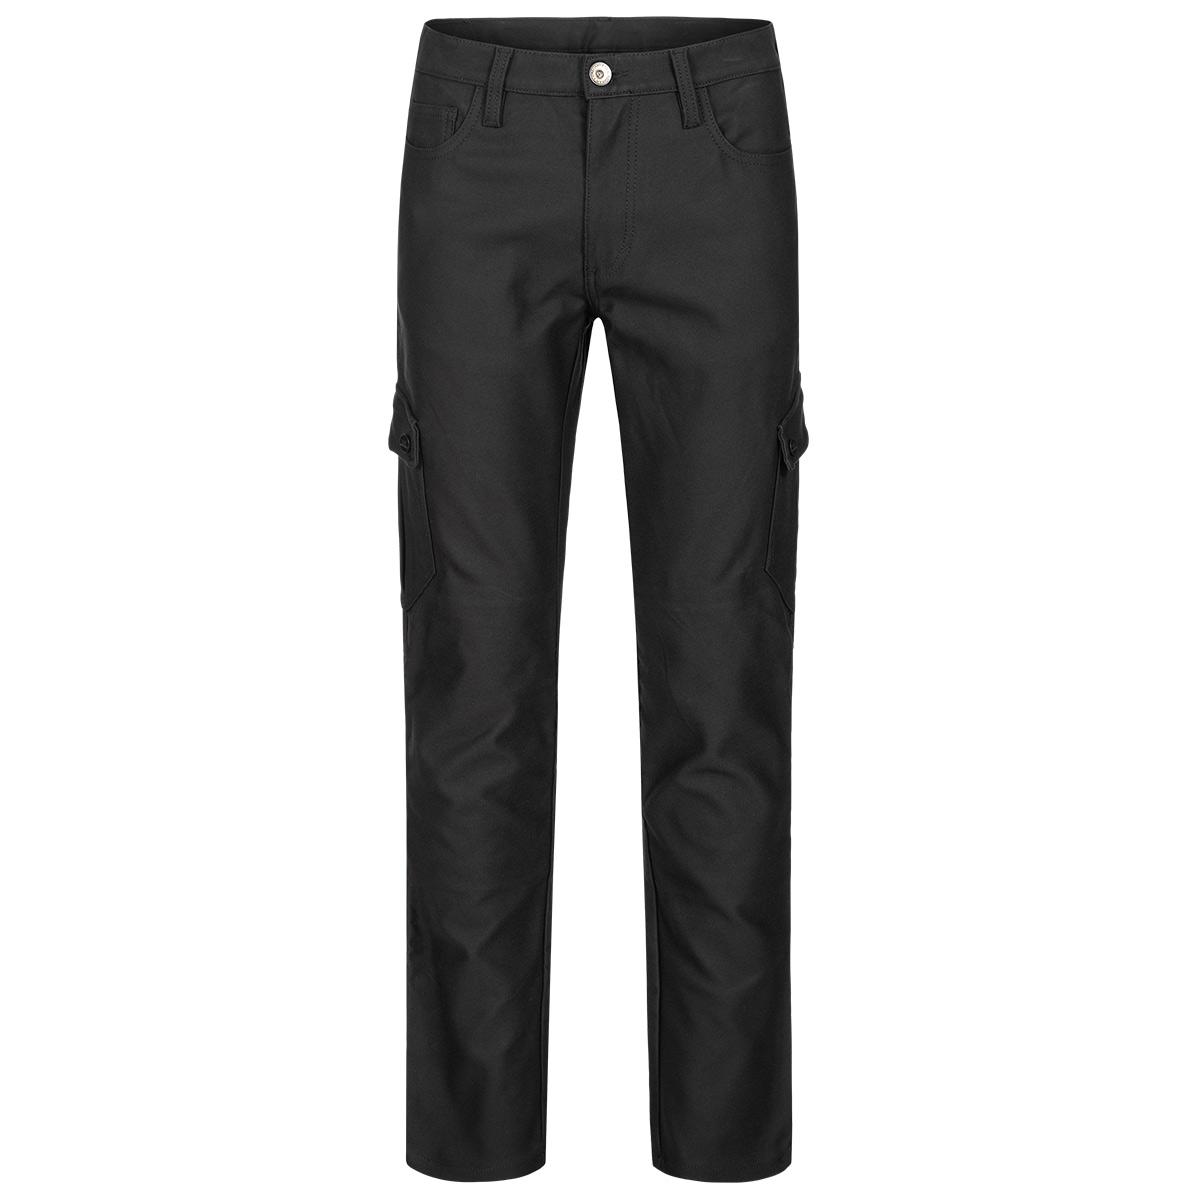 Rokker Black Jack Slim Cargo Pants